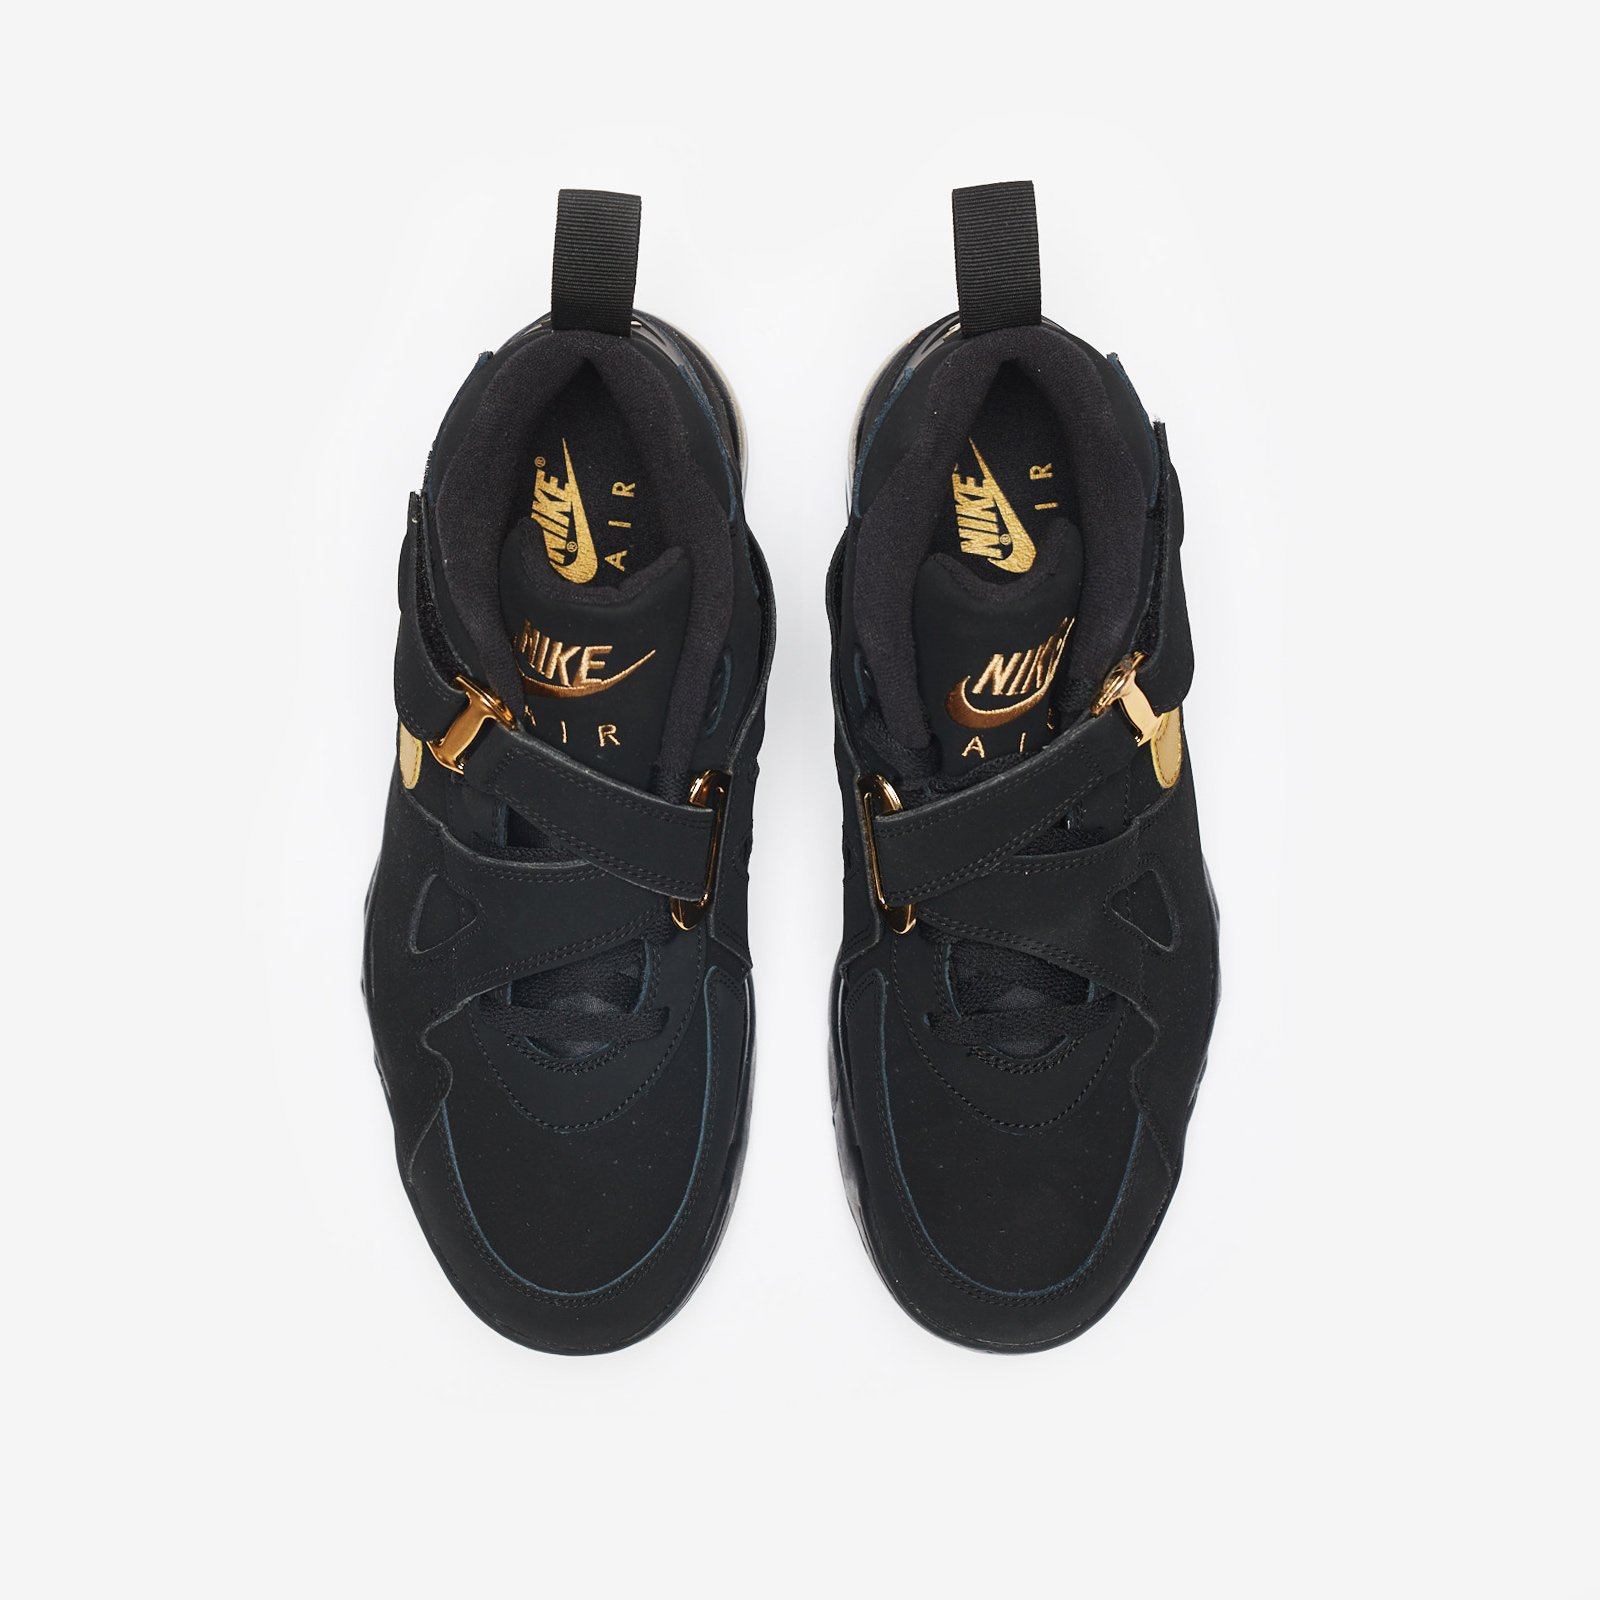 timeless design 5aeb9 bb344 Nike Air Force Max CB - Aj7922-001 - Sneakersnstuff   sneakers   streetwear  online since 1999